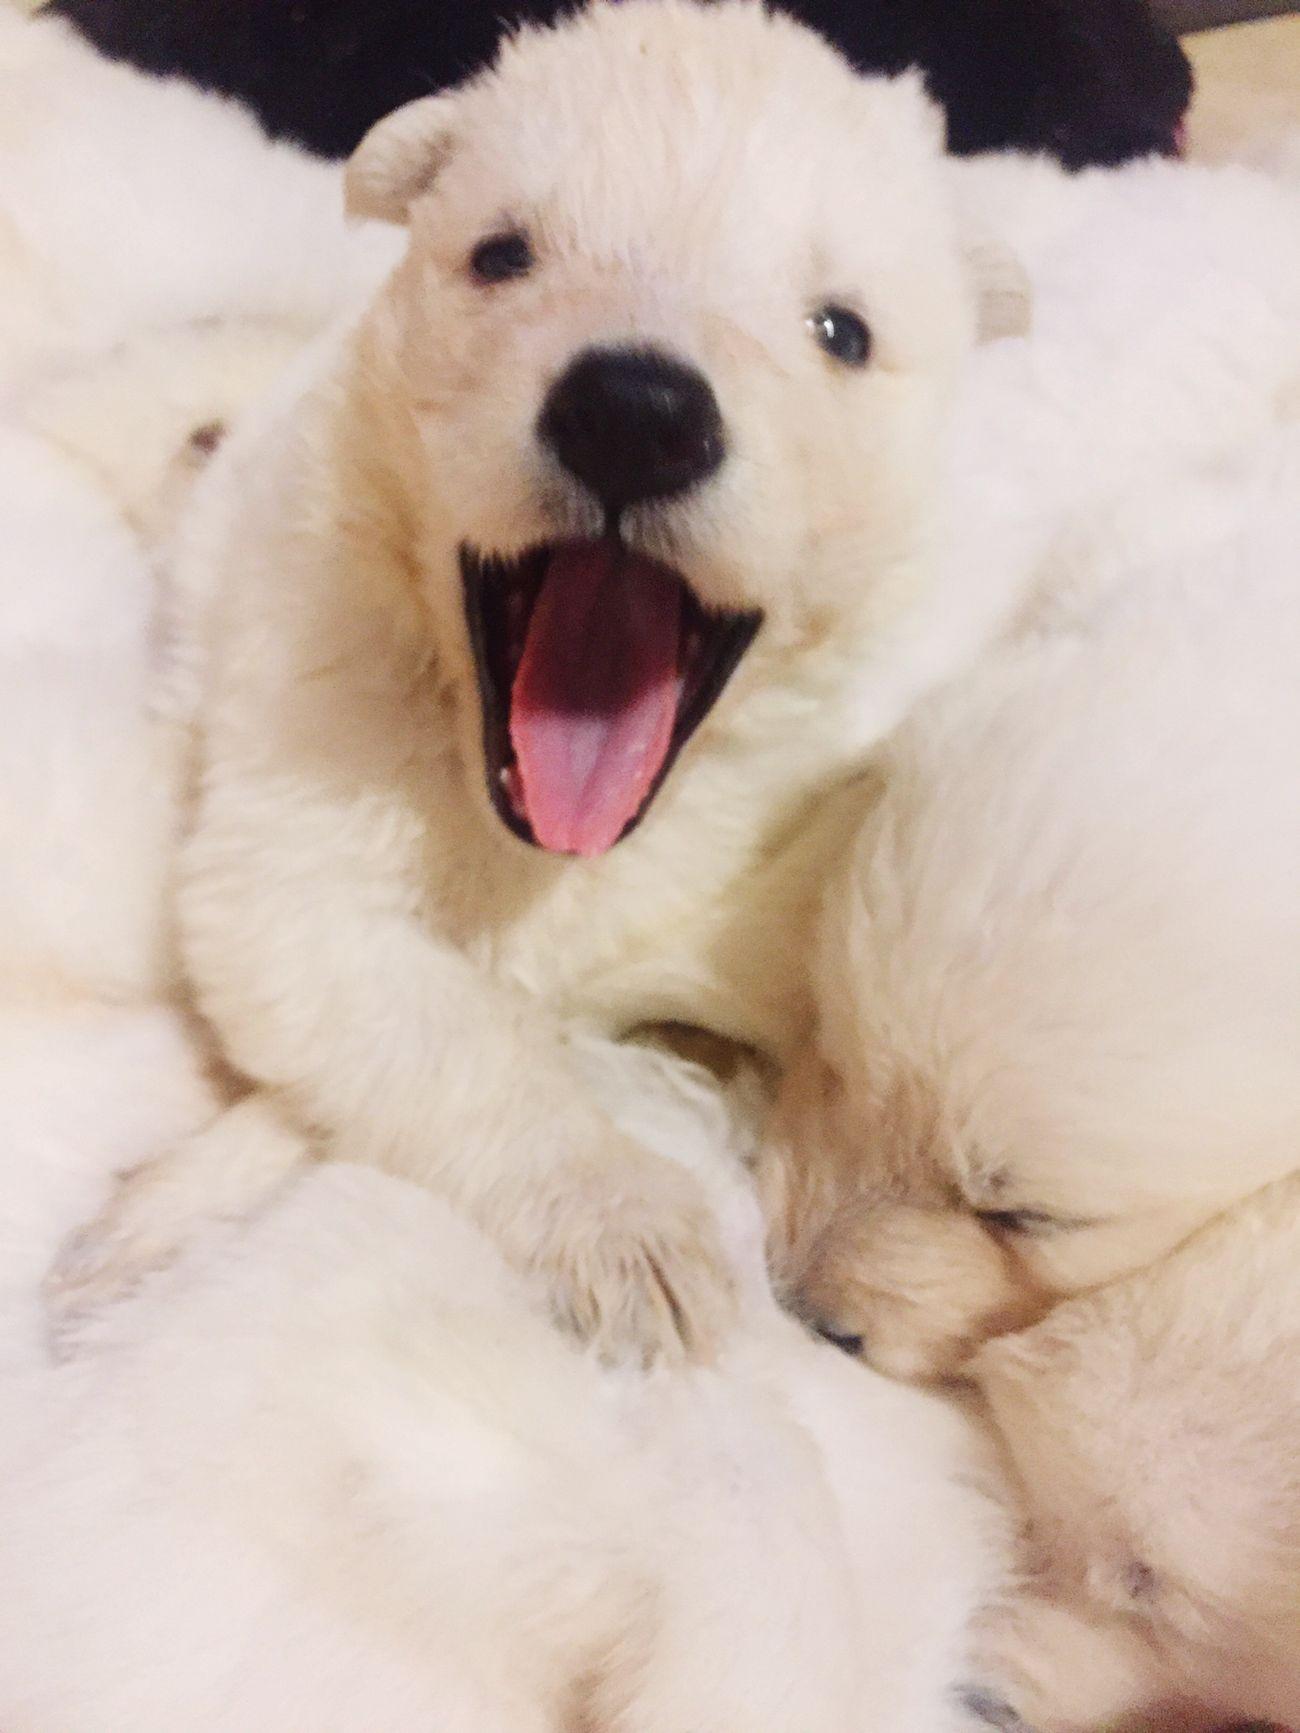 Babydog Cuteness Littledog White Beauty First Eyeem Photo